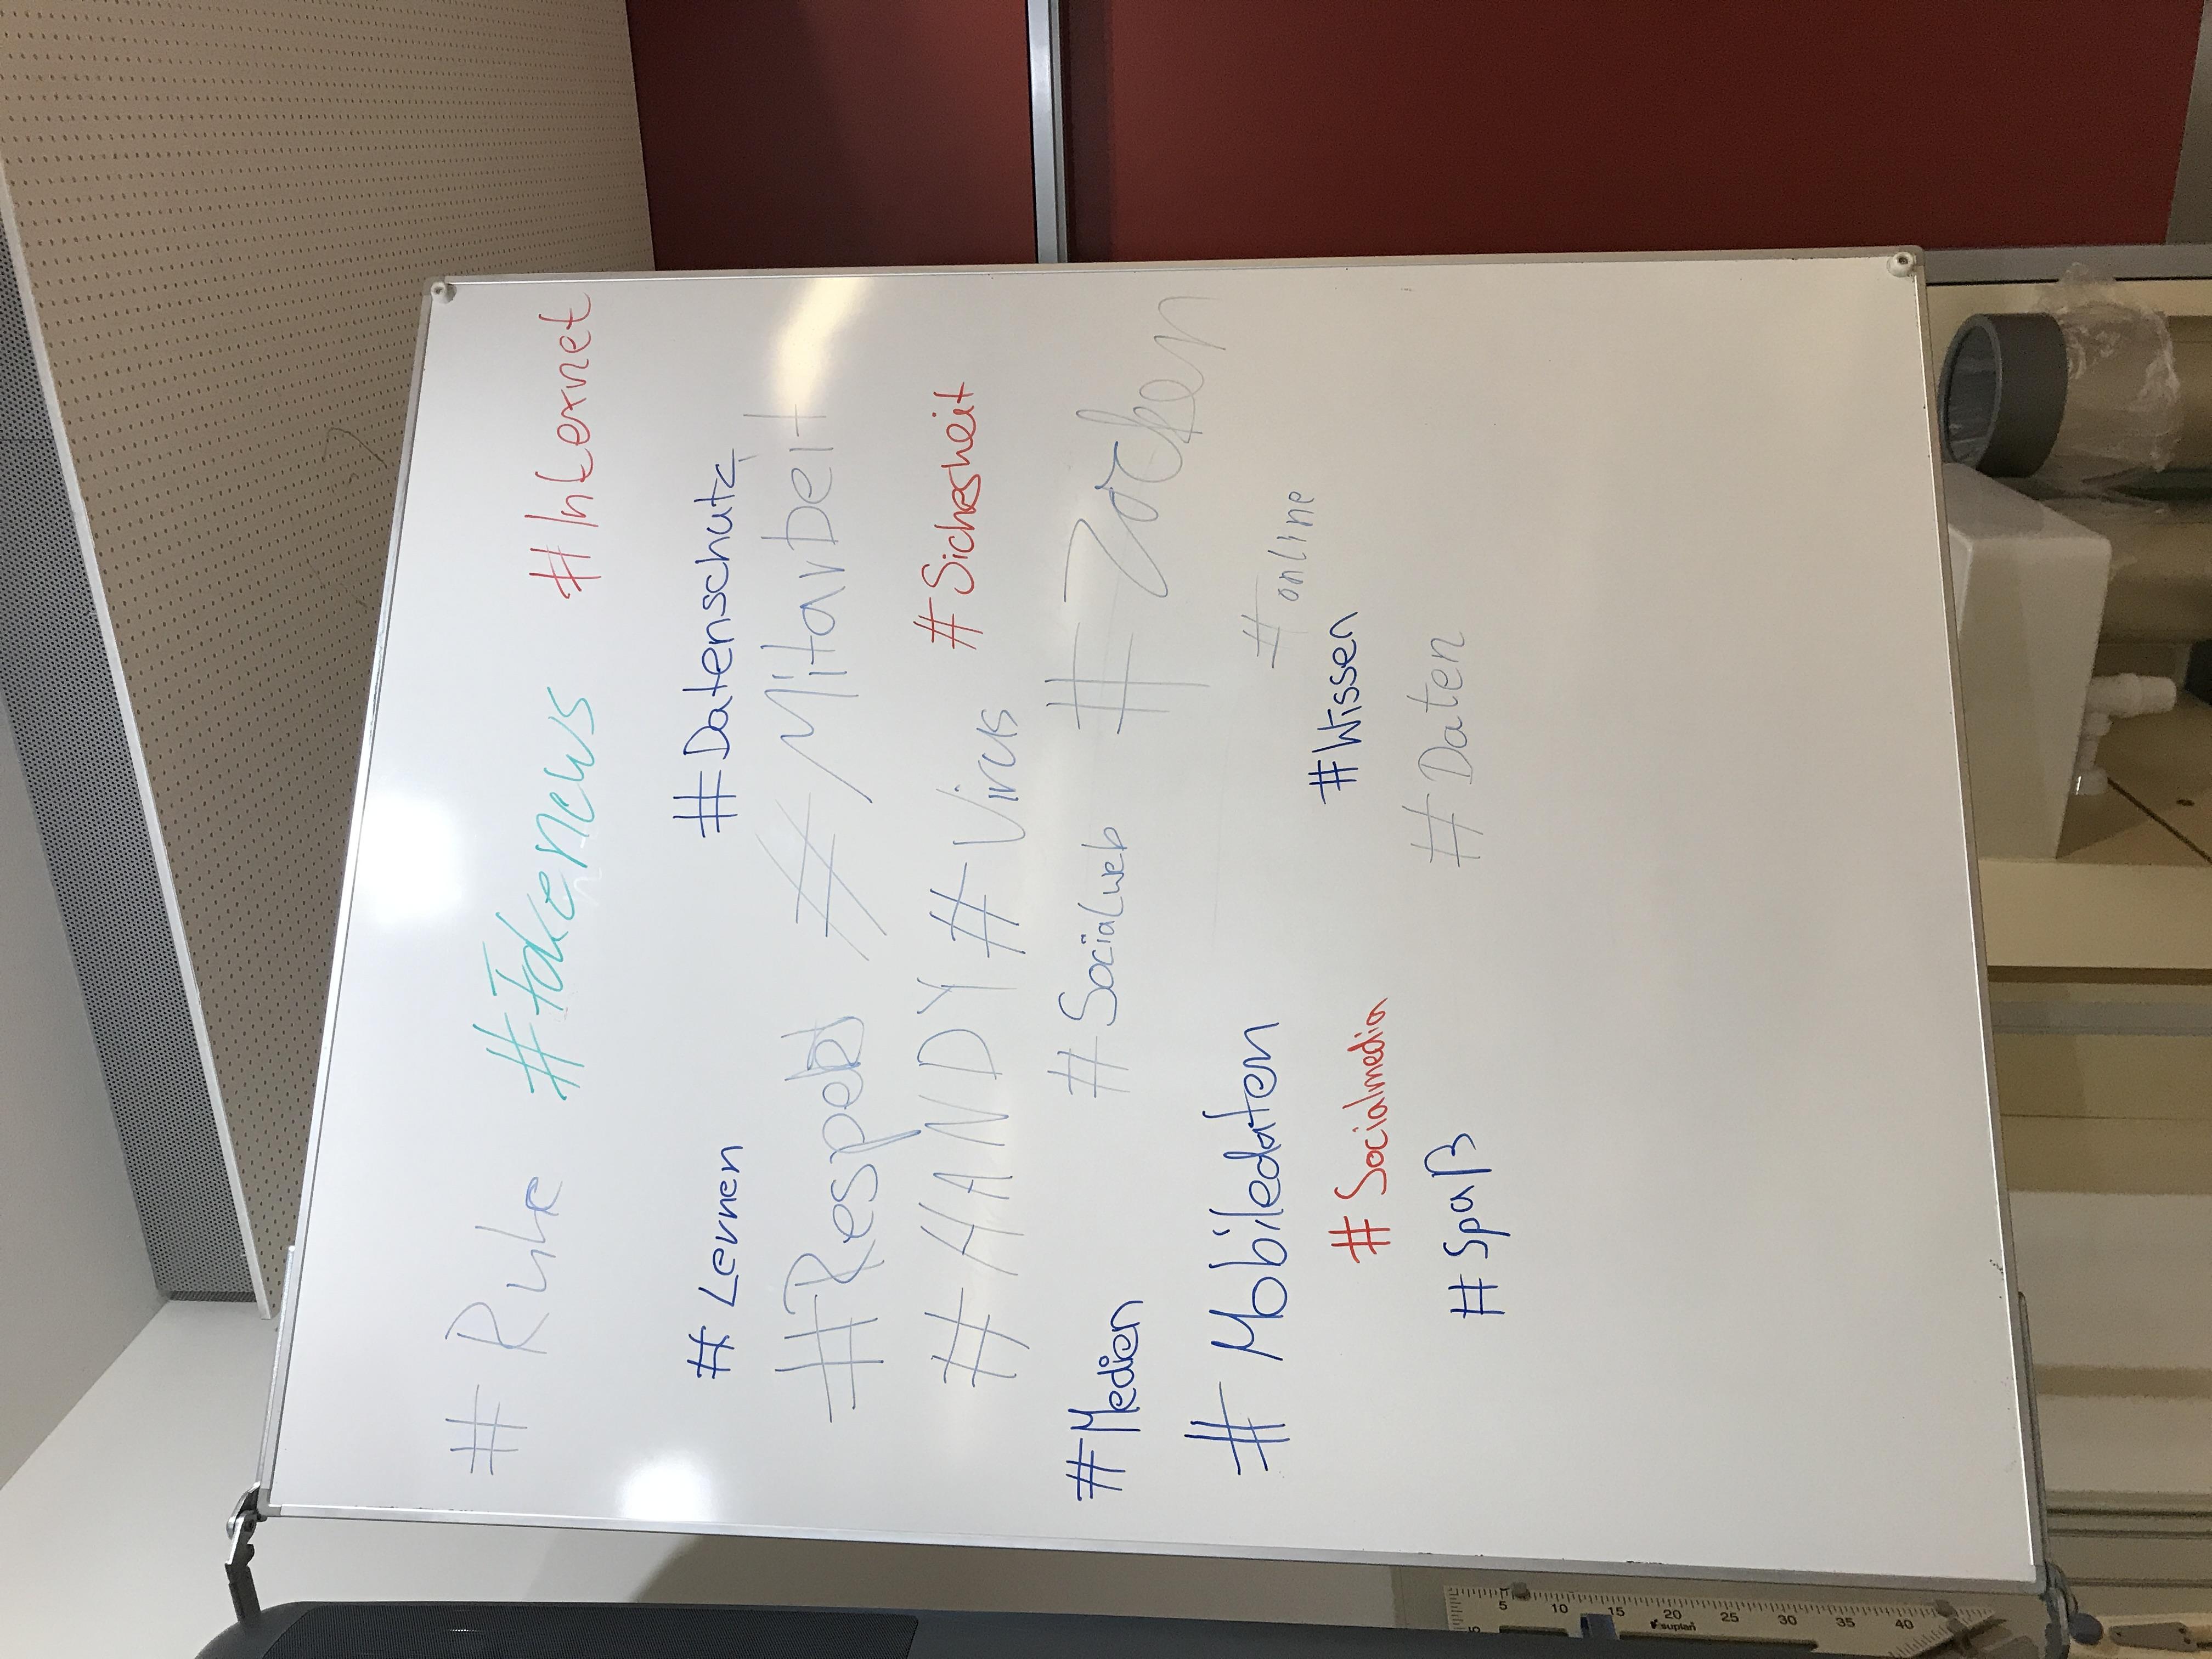 Humboldt-Gymnasium Radeberg Social Web macht Schule